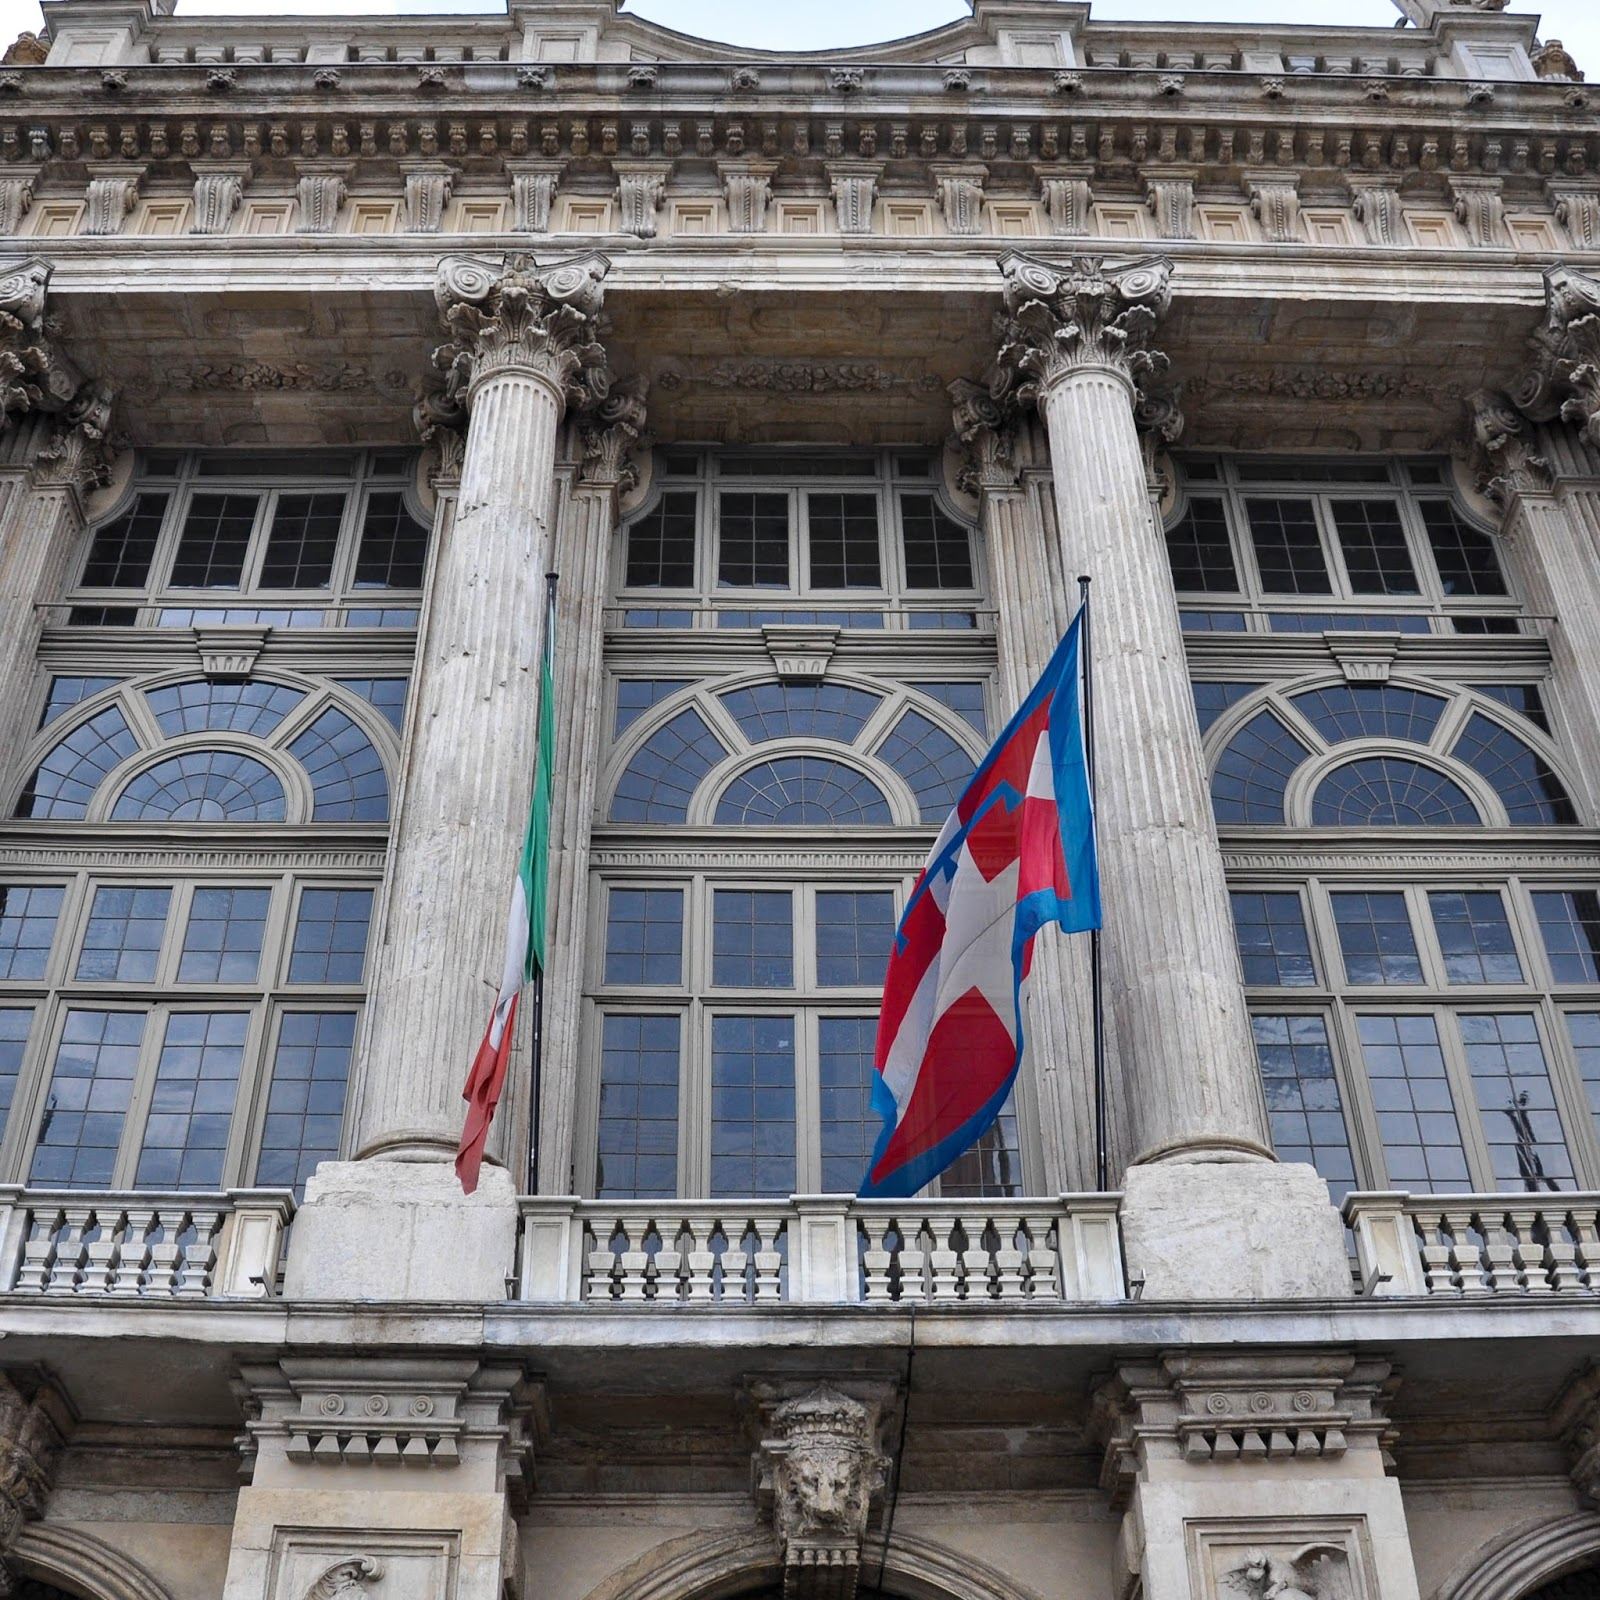 Close-up of the facade, Palazzo Madama, Turin, Italy